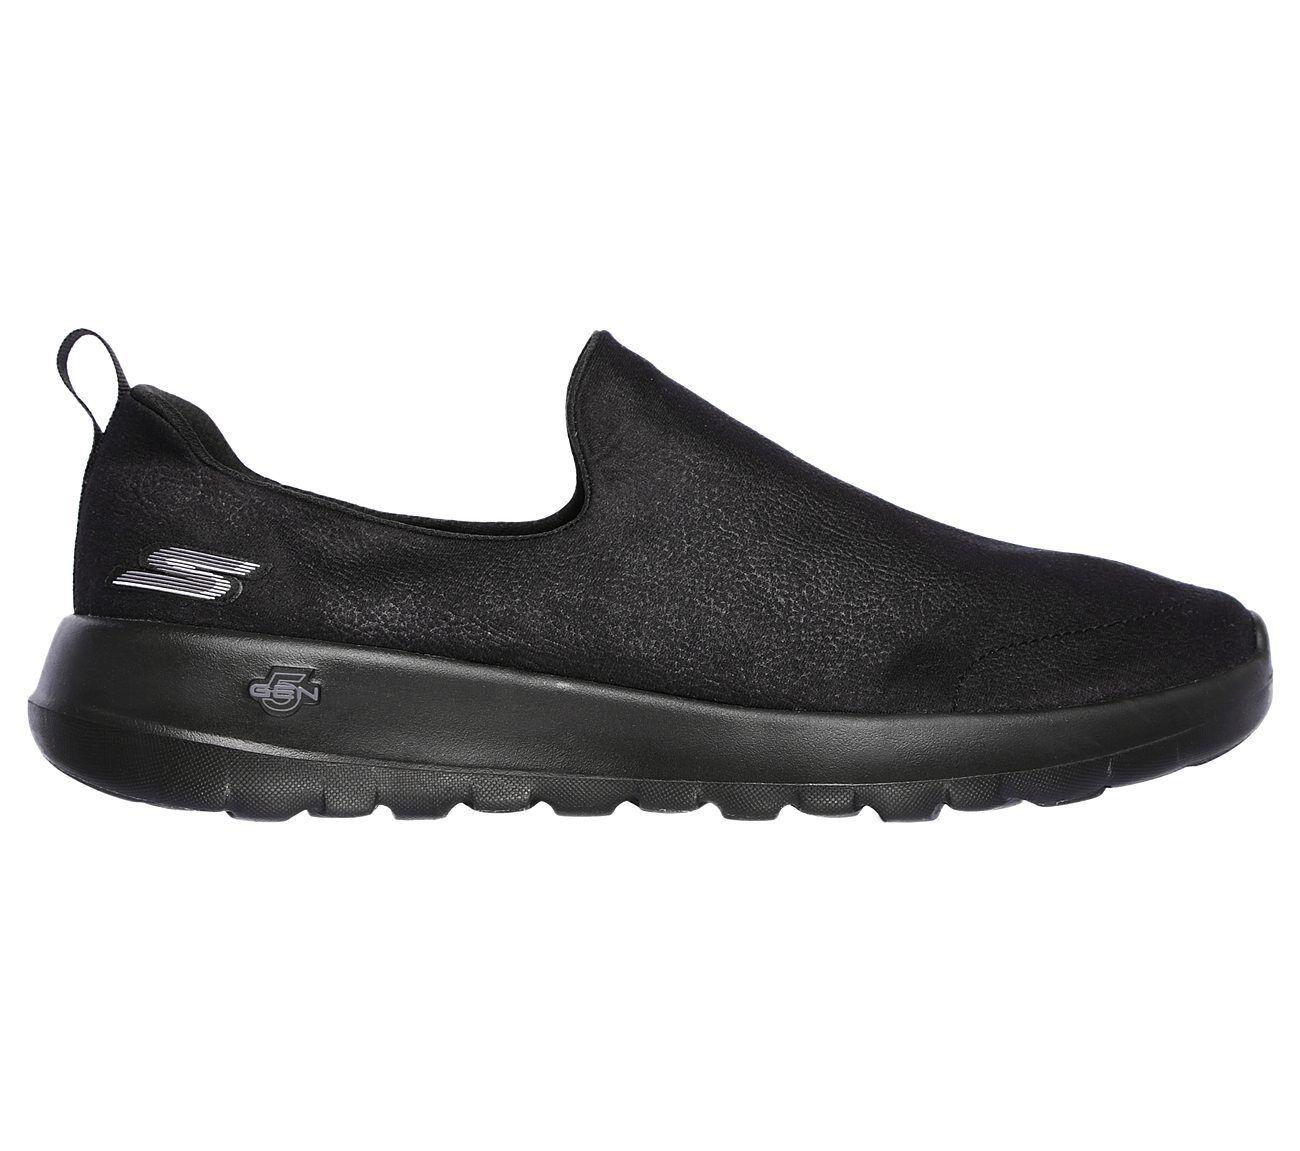 Skechers Go Walk Max - Escalate Zapatillas 5GEN Goga Zapatos Atléticos Hombre